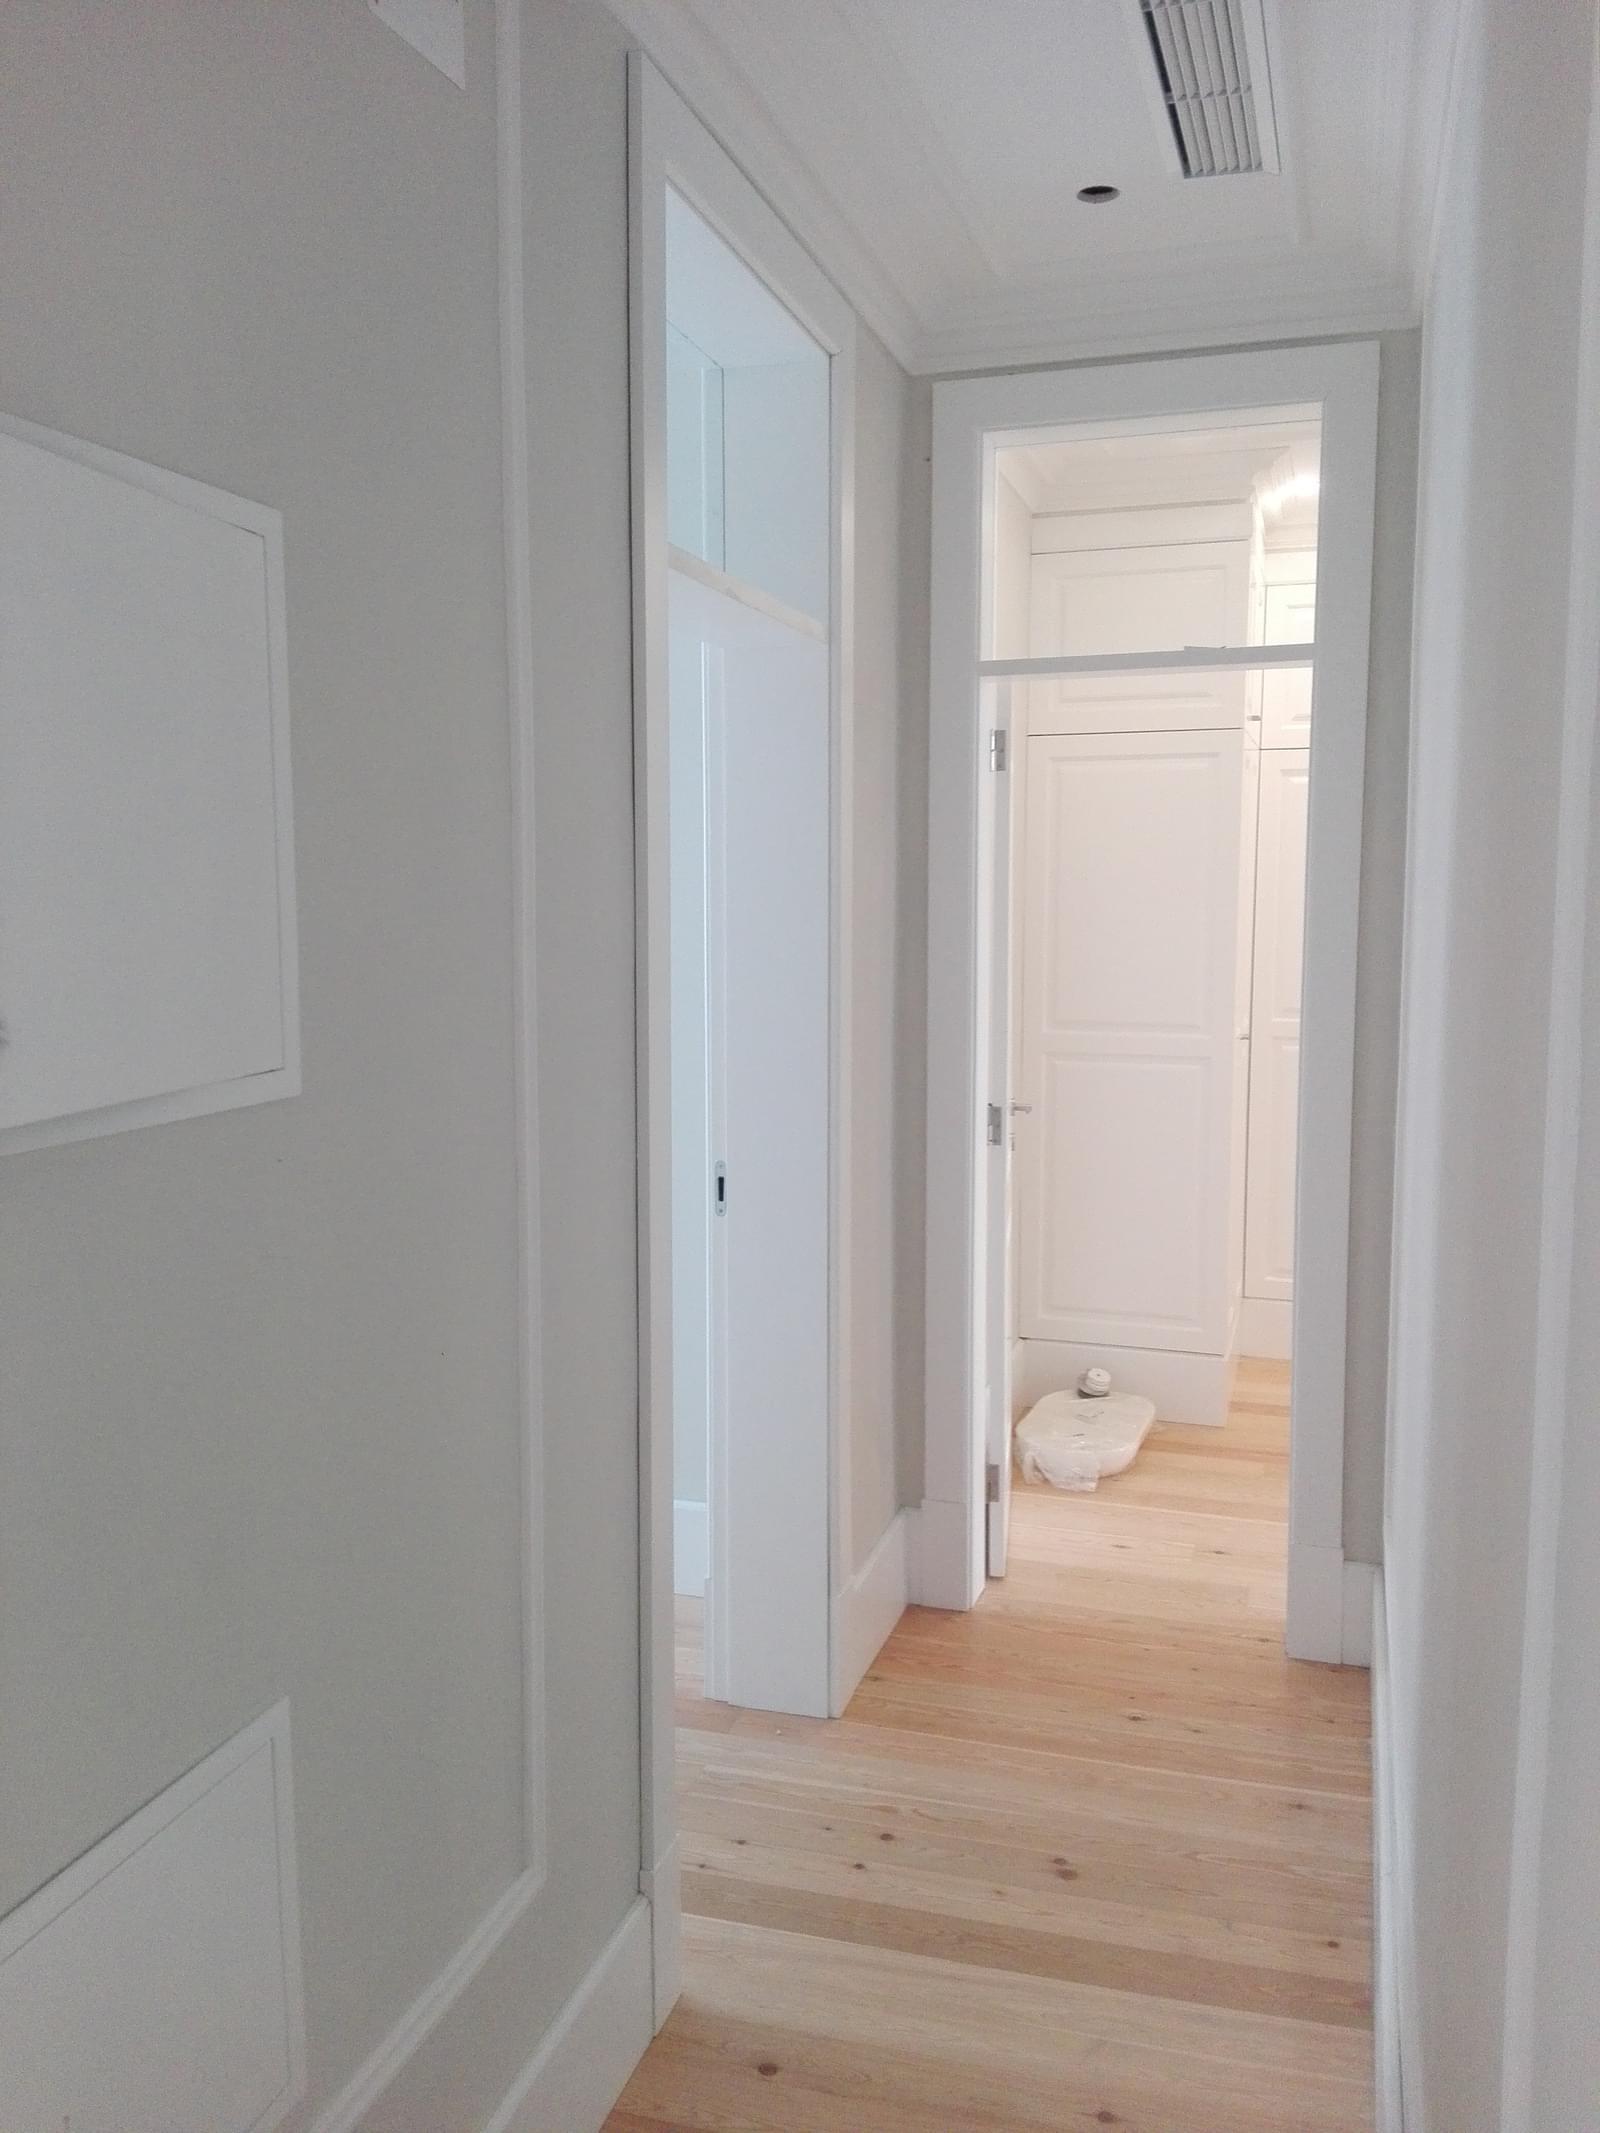 2 bedroom apartment refurbished